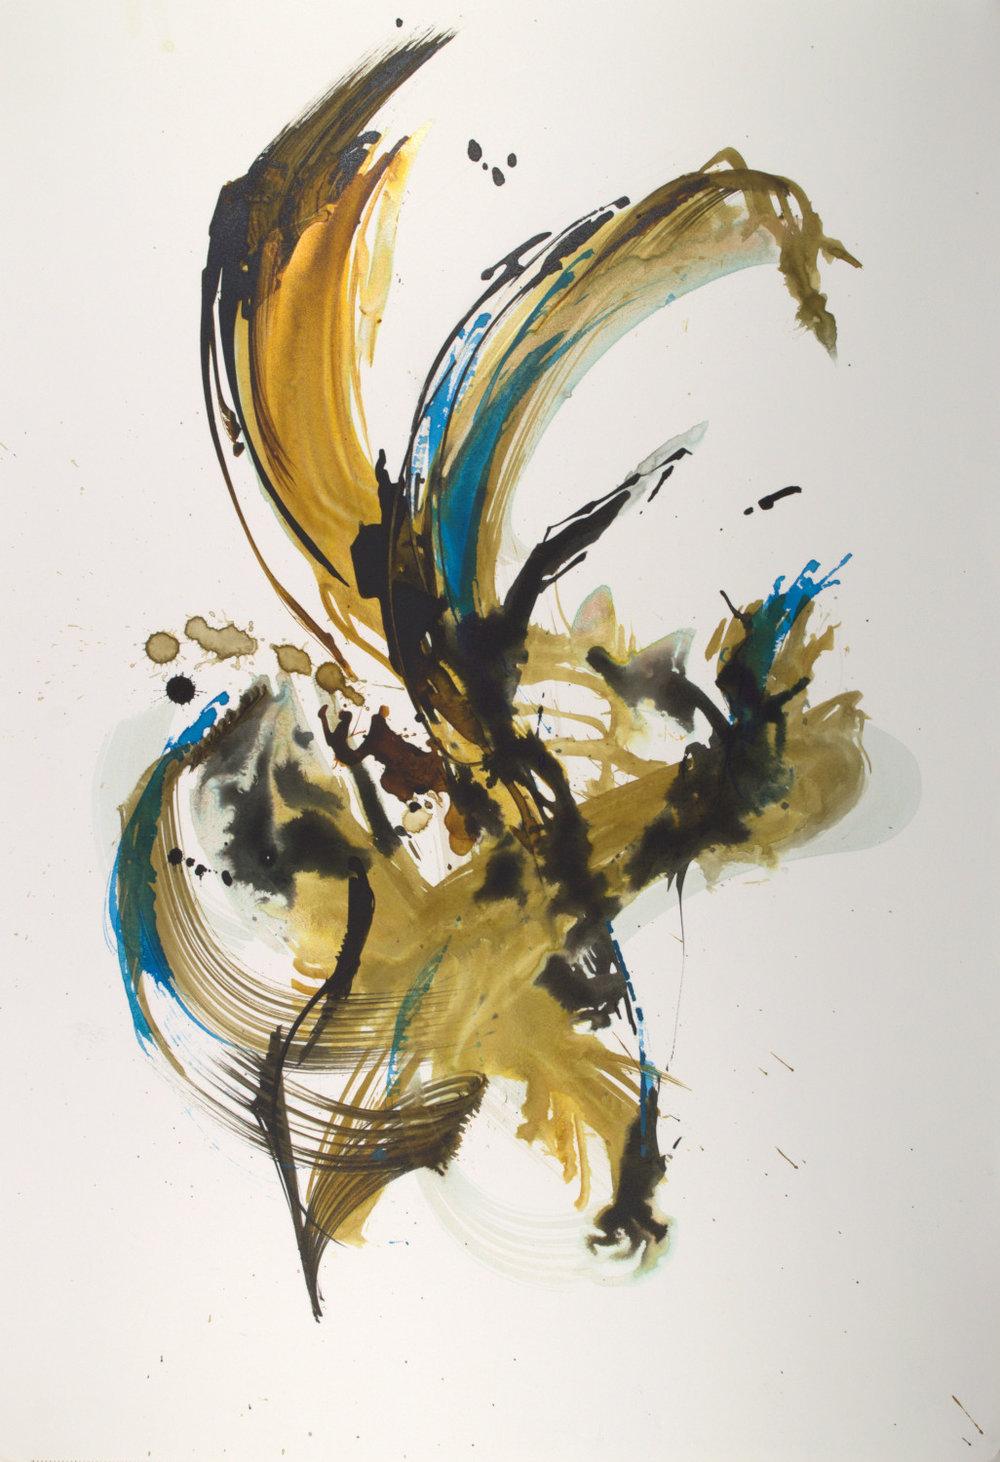 Symphonic Movement VI - 13x9 - available